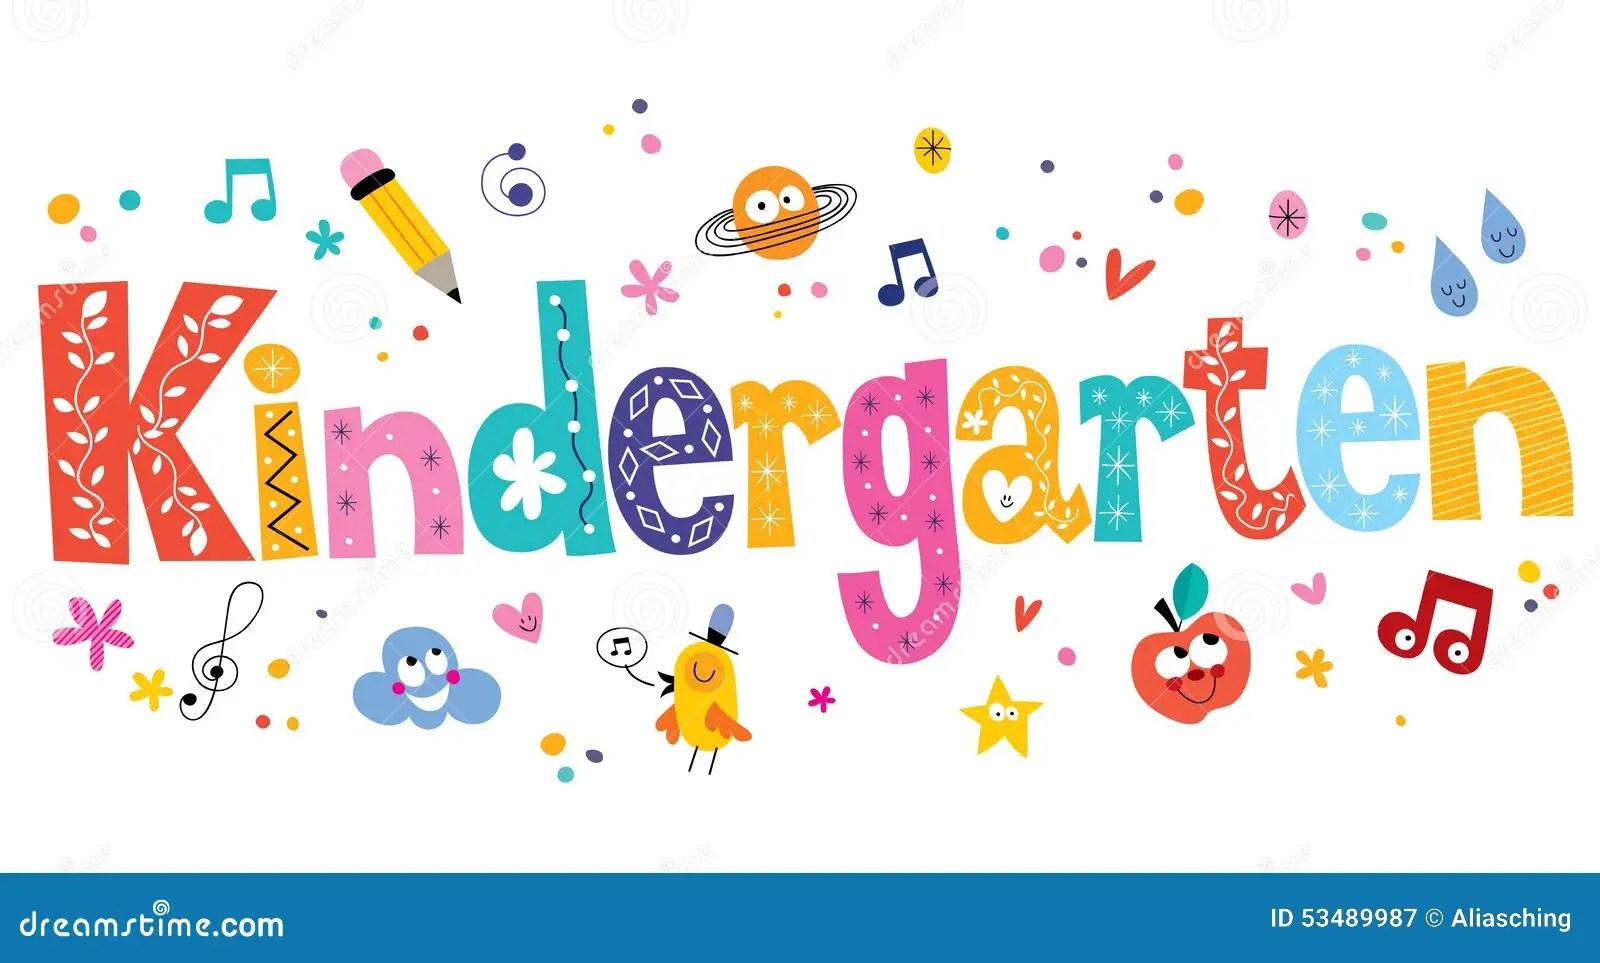 word designs word designs accents alex tk